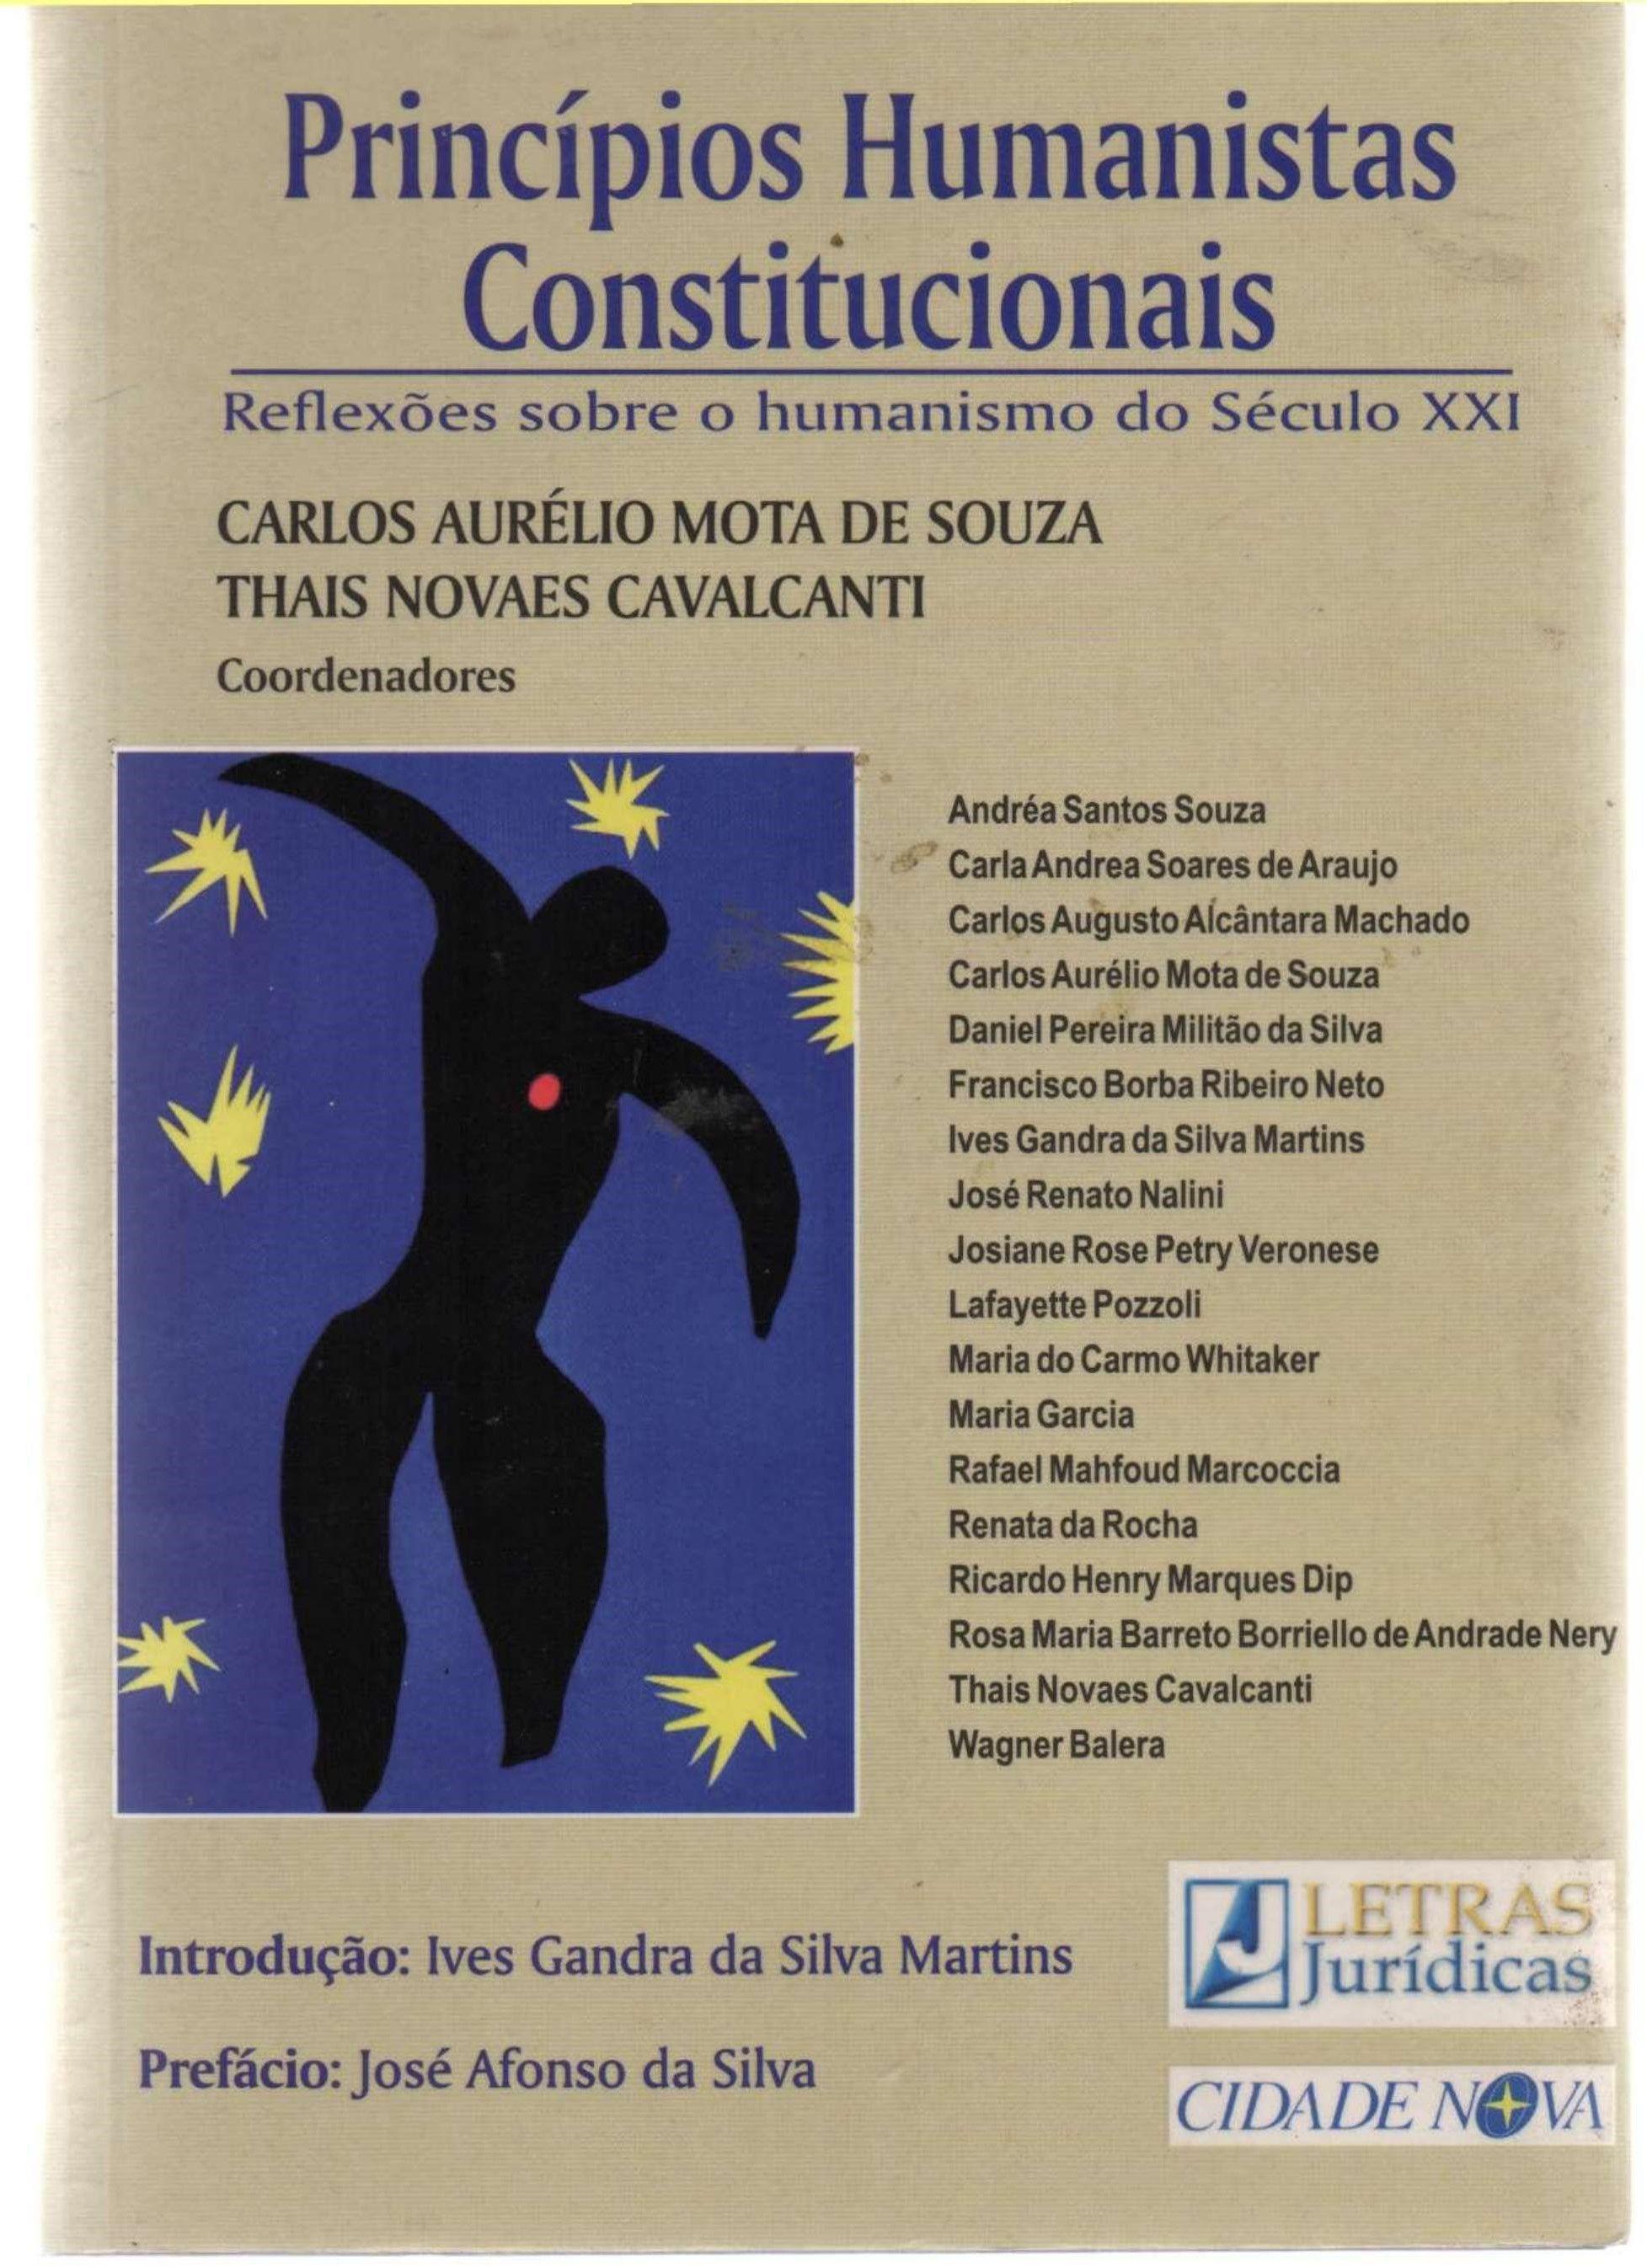 Princípios Humanistas Constitucionais